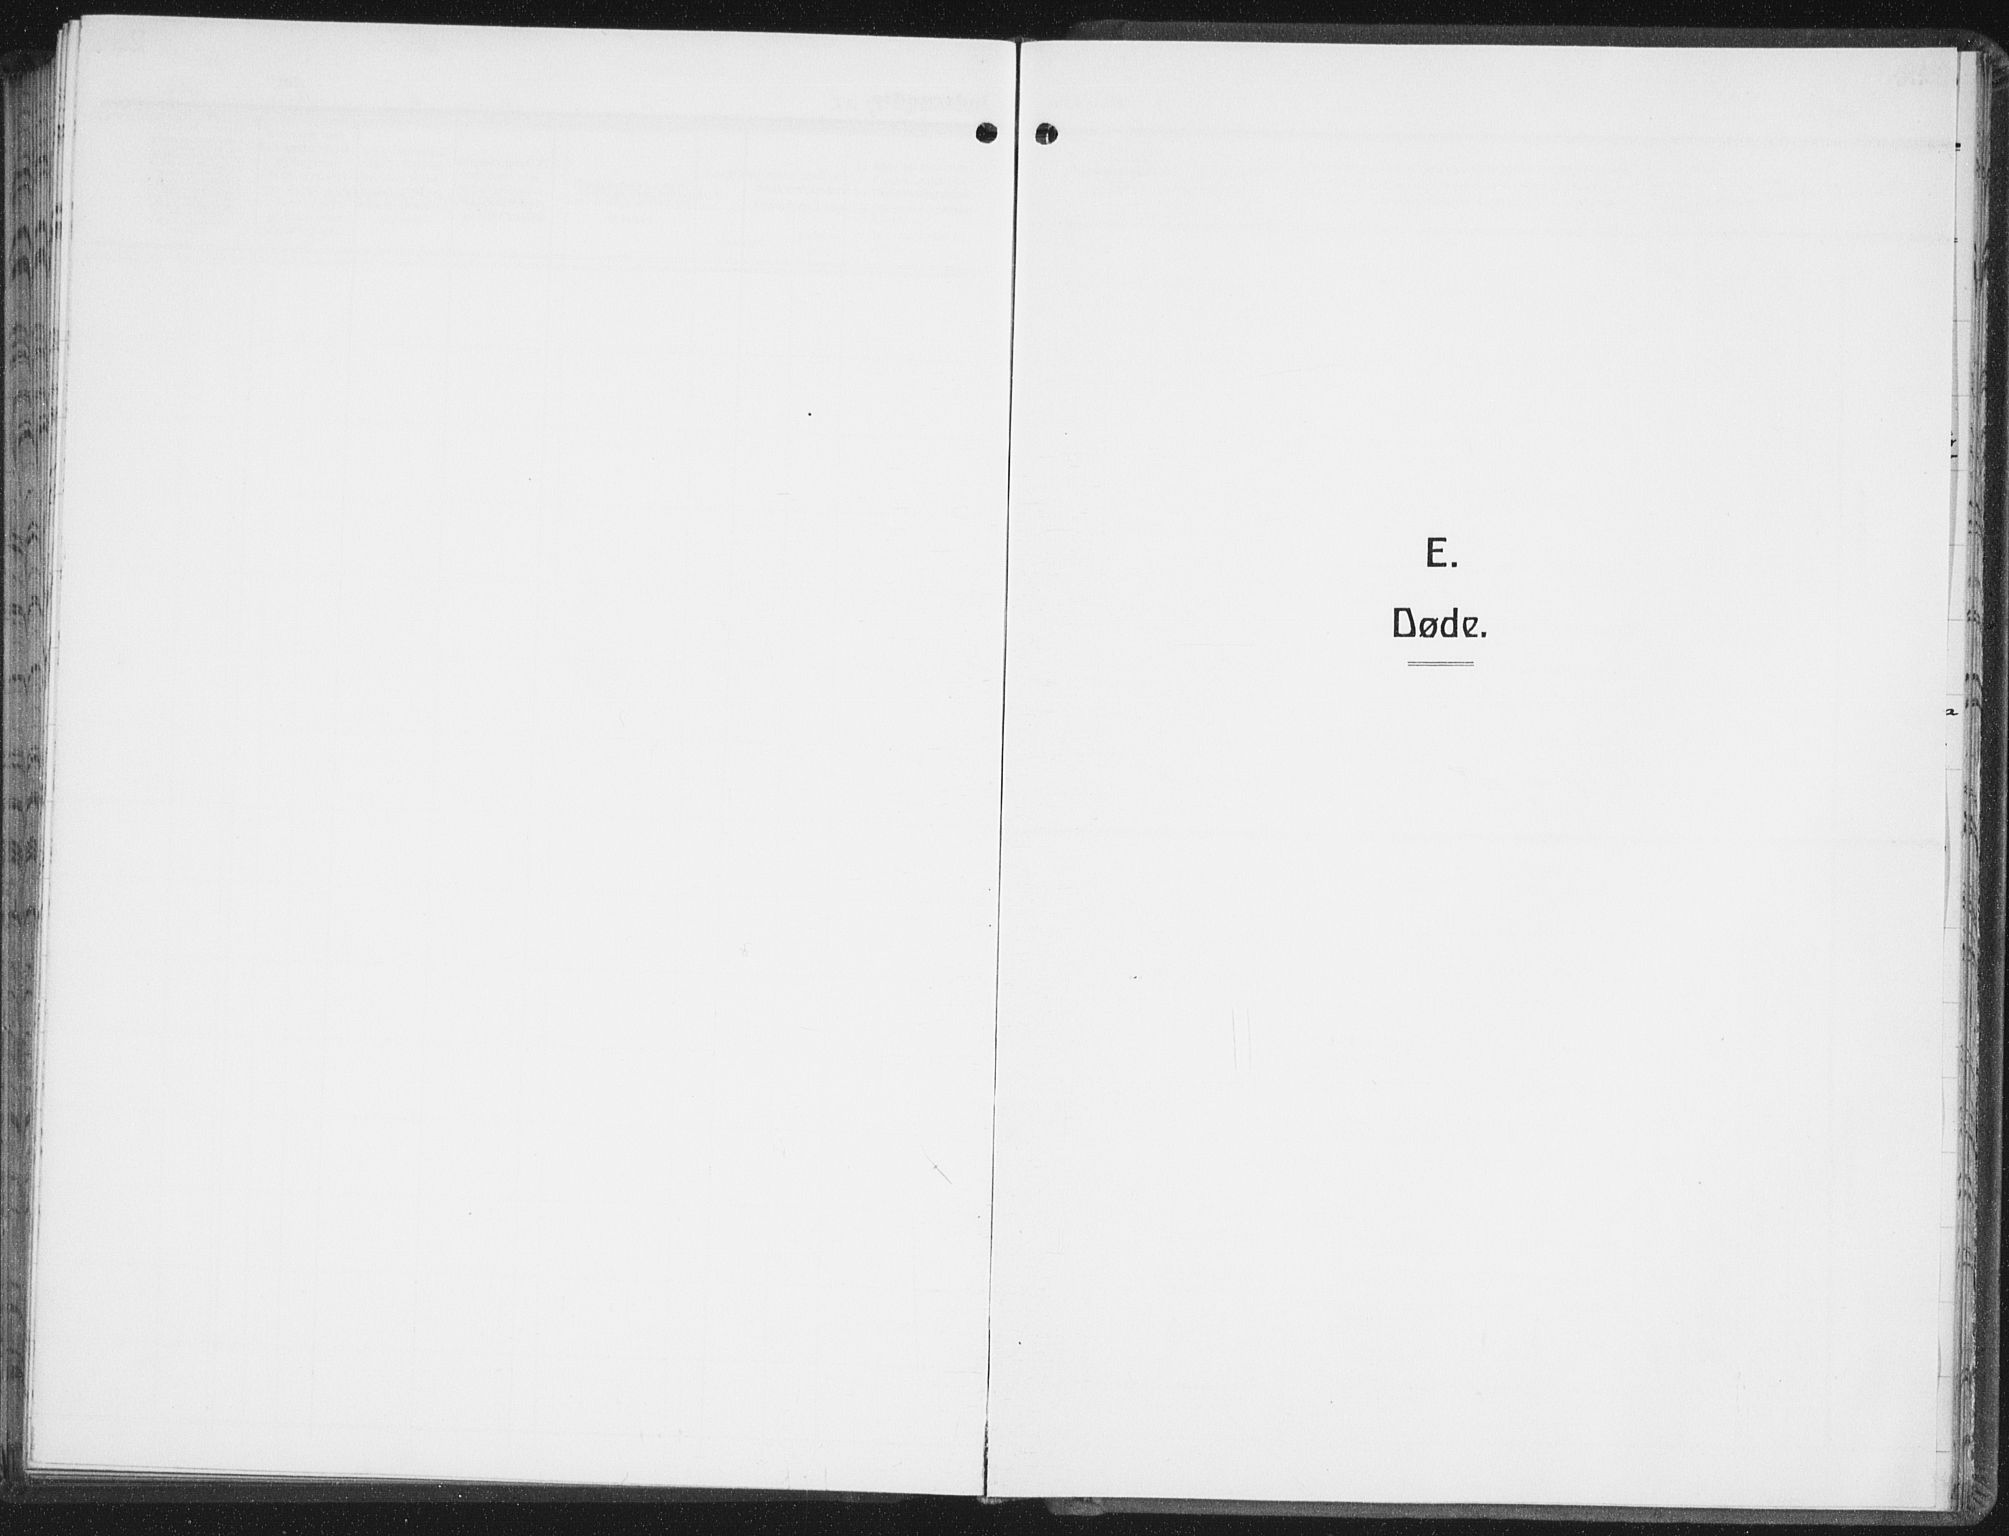 SAT, Ministerialprotokoller, klokkerbøker og fødselsregistre - Nordland, 843/L0640: Klokkerbok nr. 843C09, 1925-1941